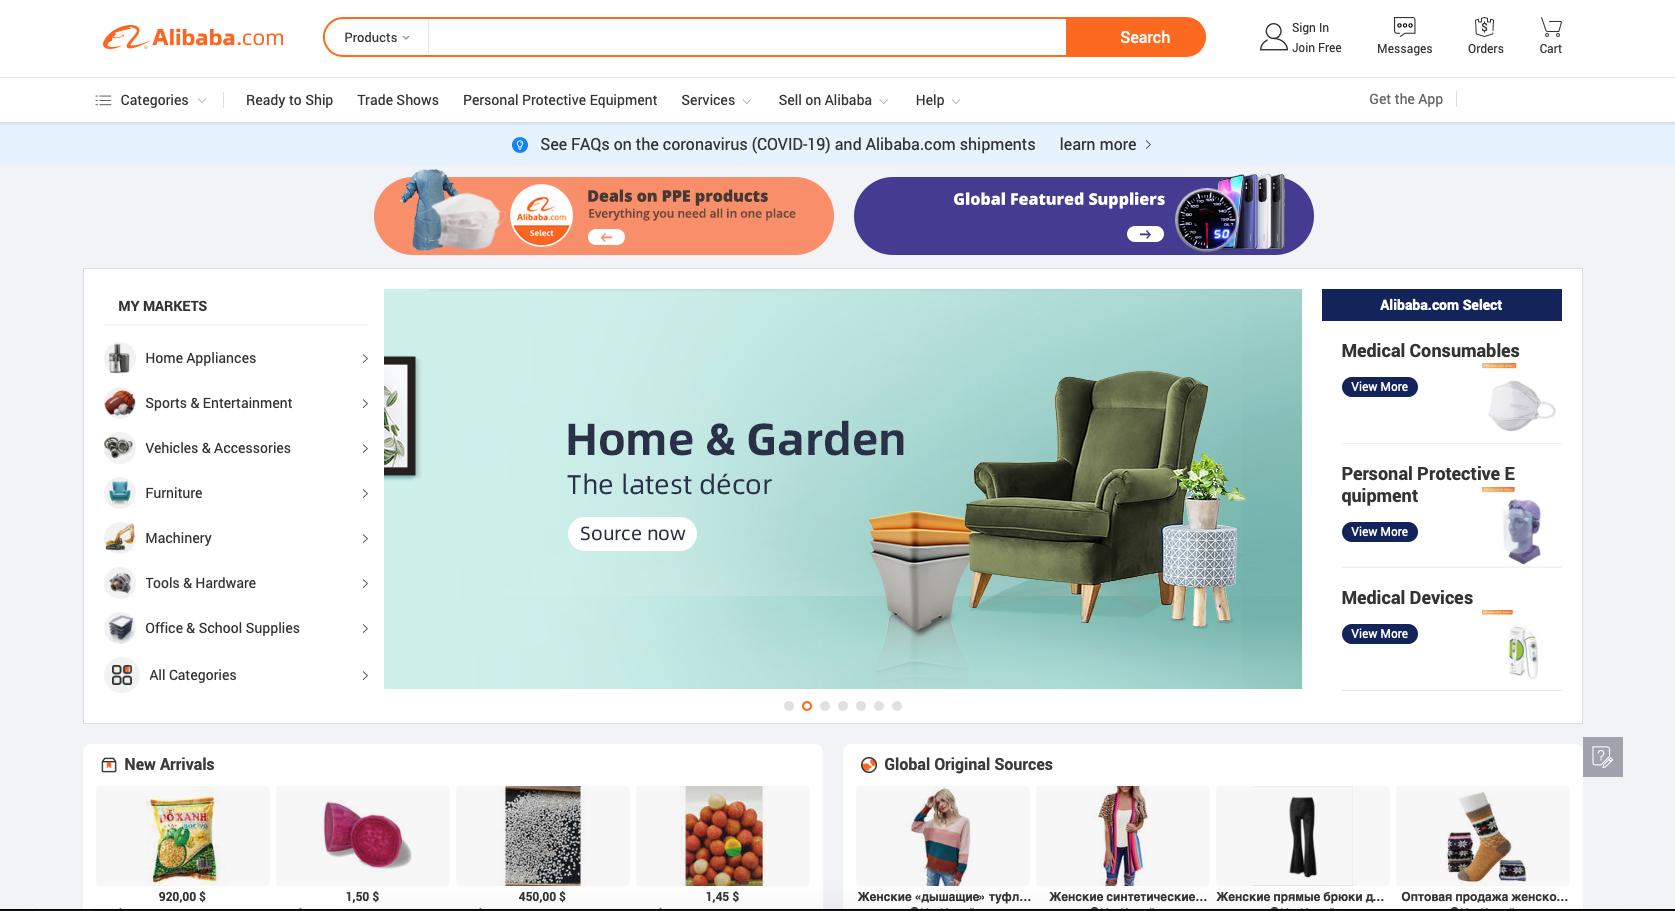 Alibaba b2b ecommerce website